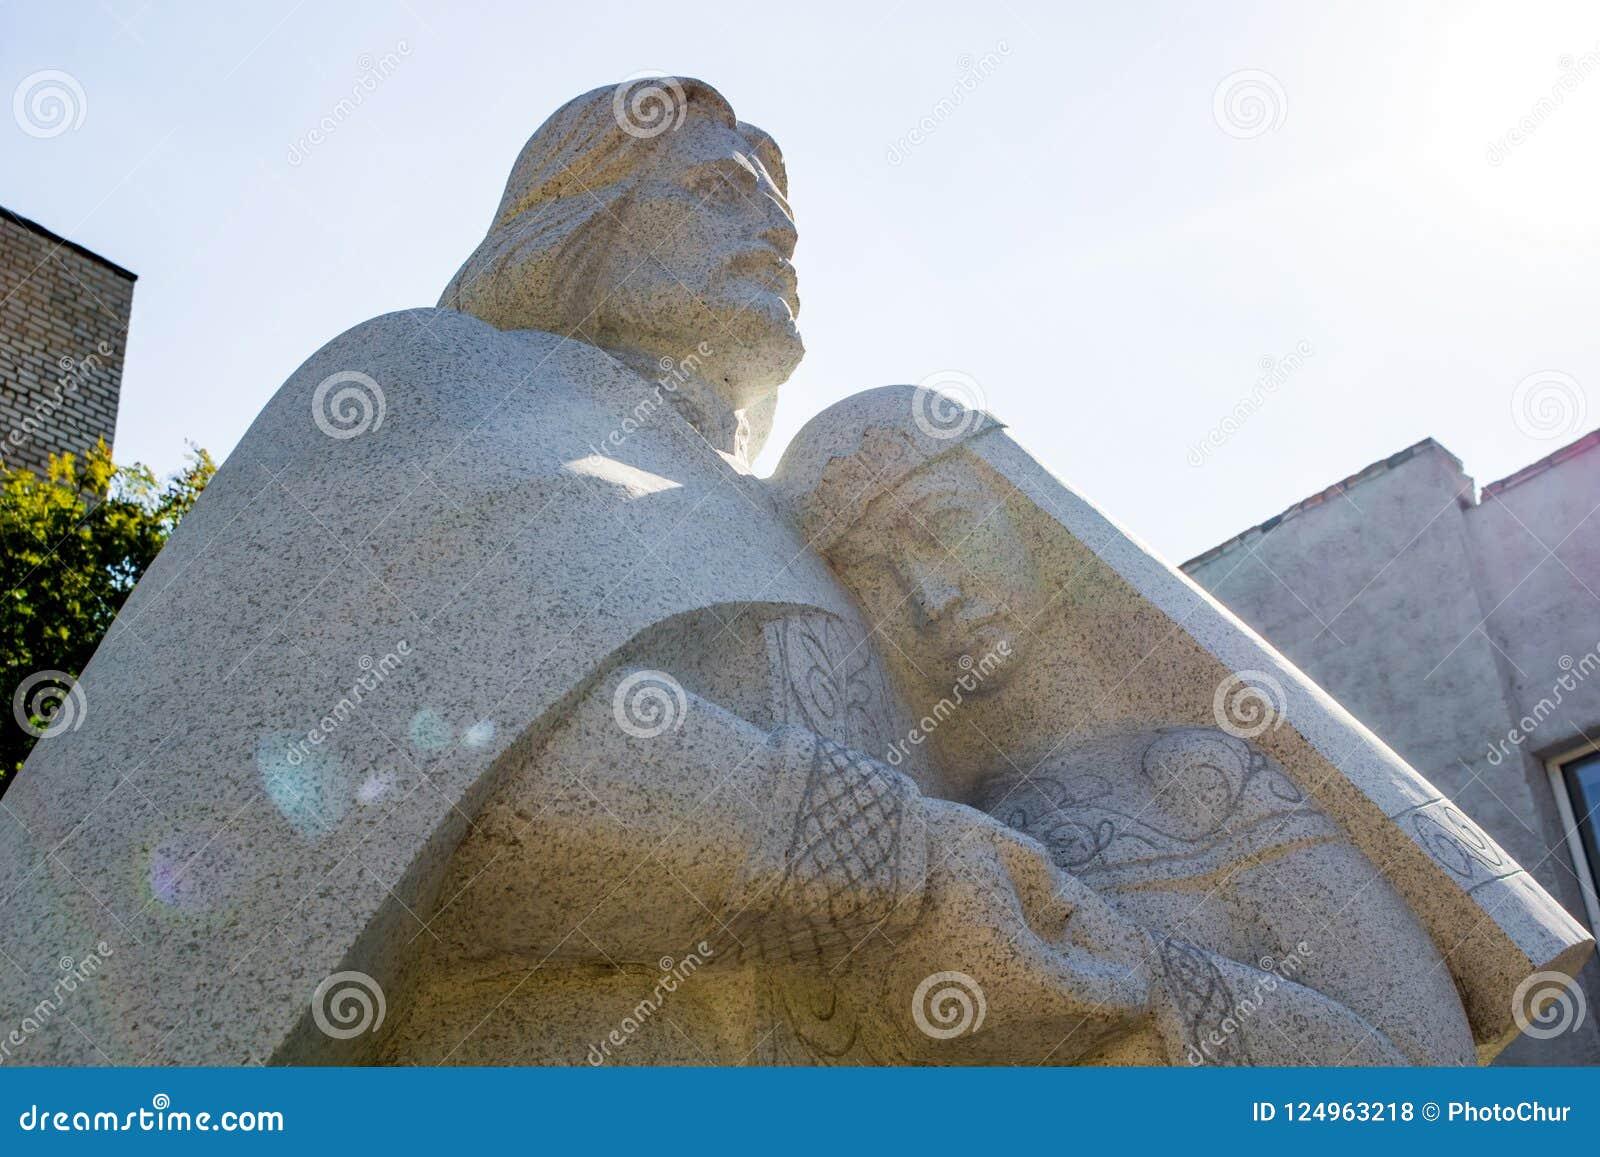 Balabanovo, Russie - août 2018 : Monument à St Peter et à Fevronia de Murom